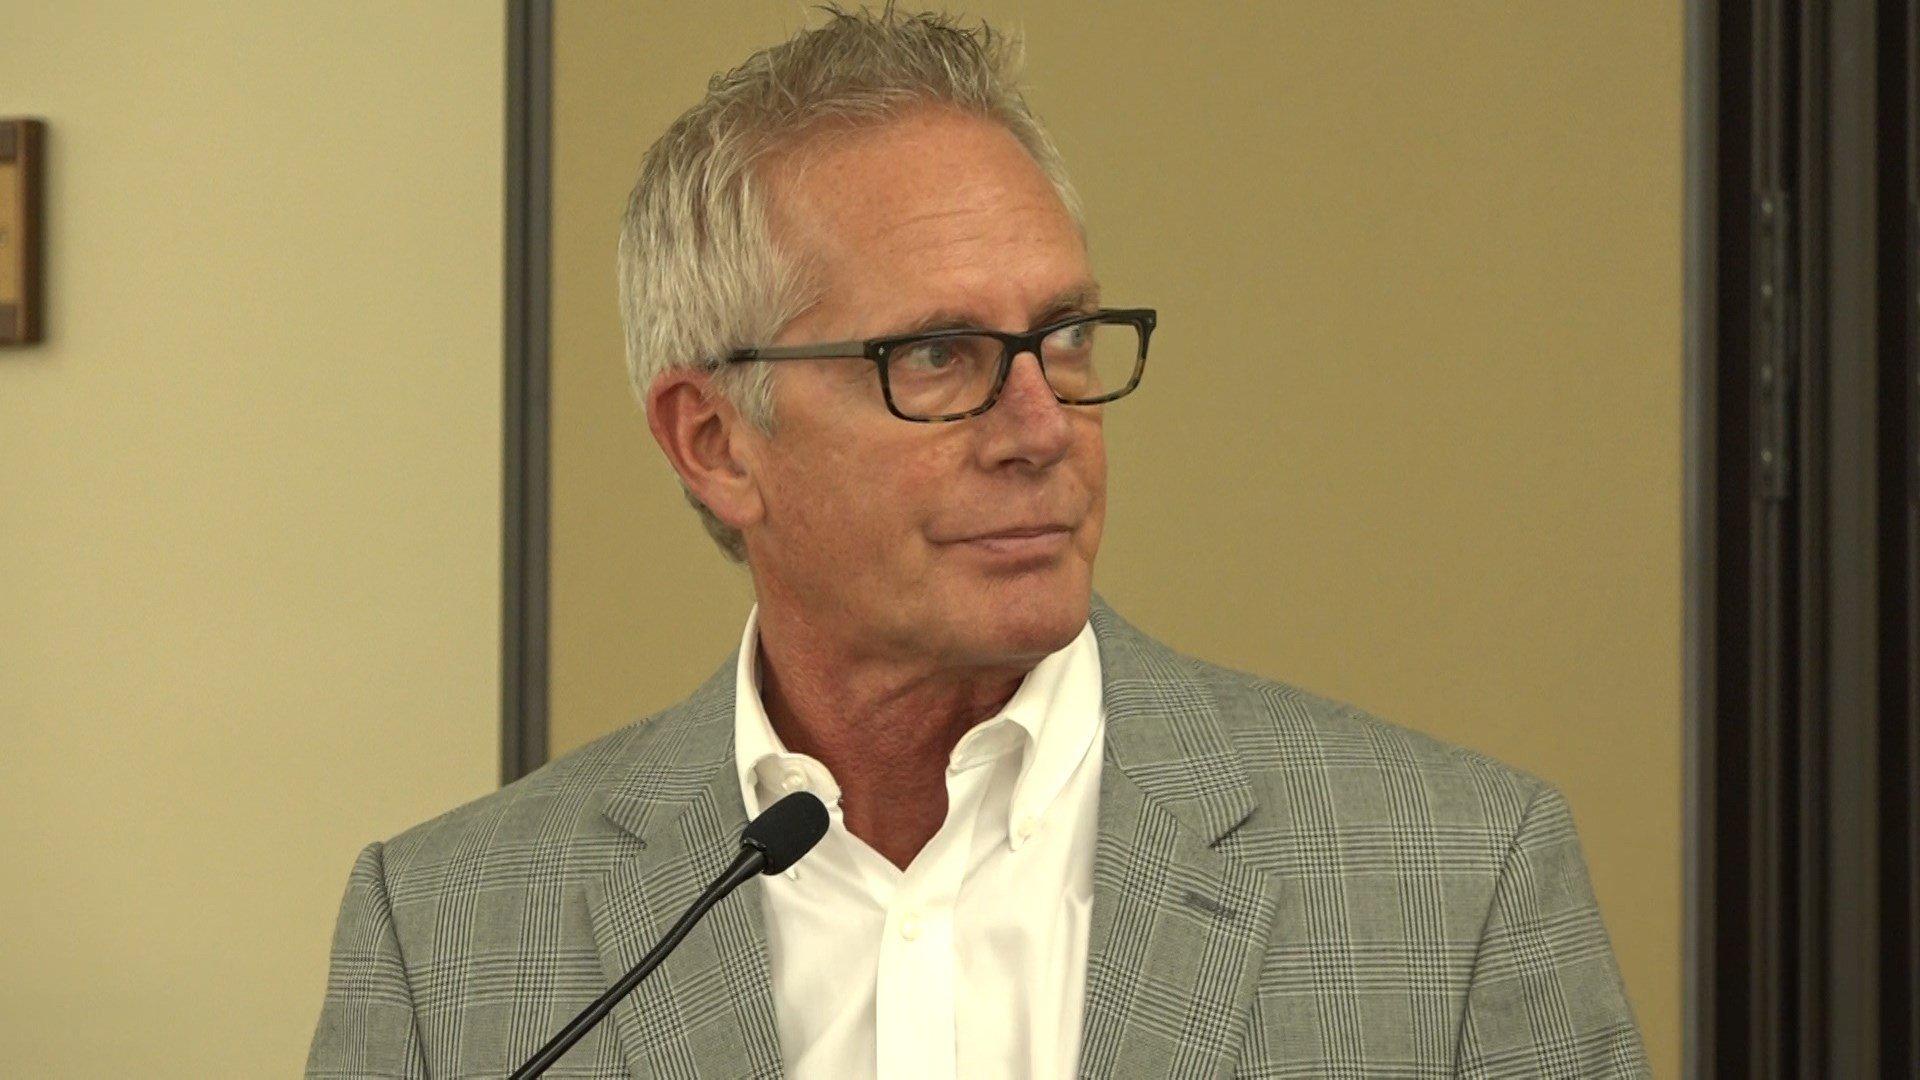 Montana Health Co-op President Larry Turney